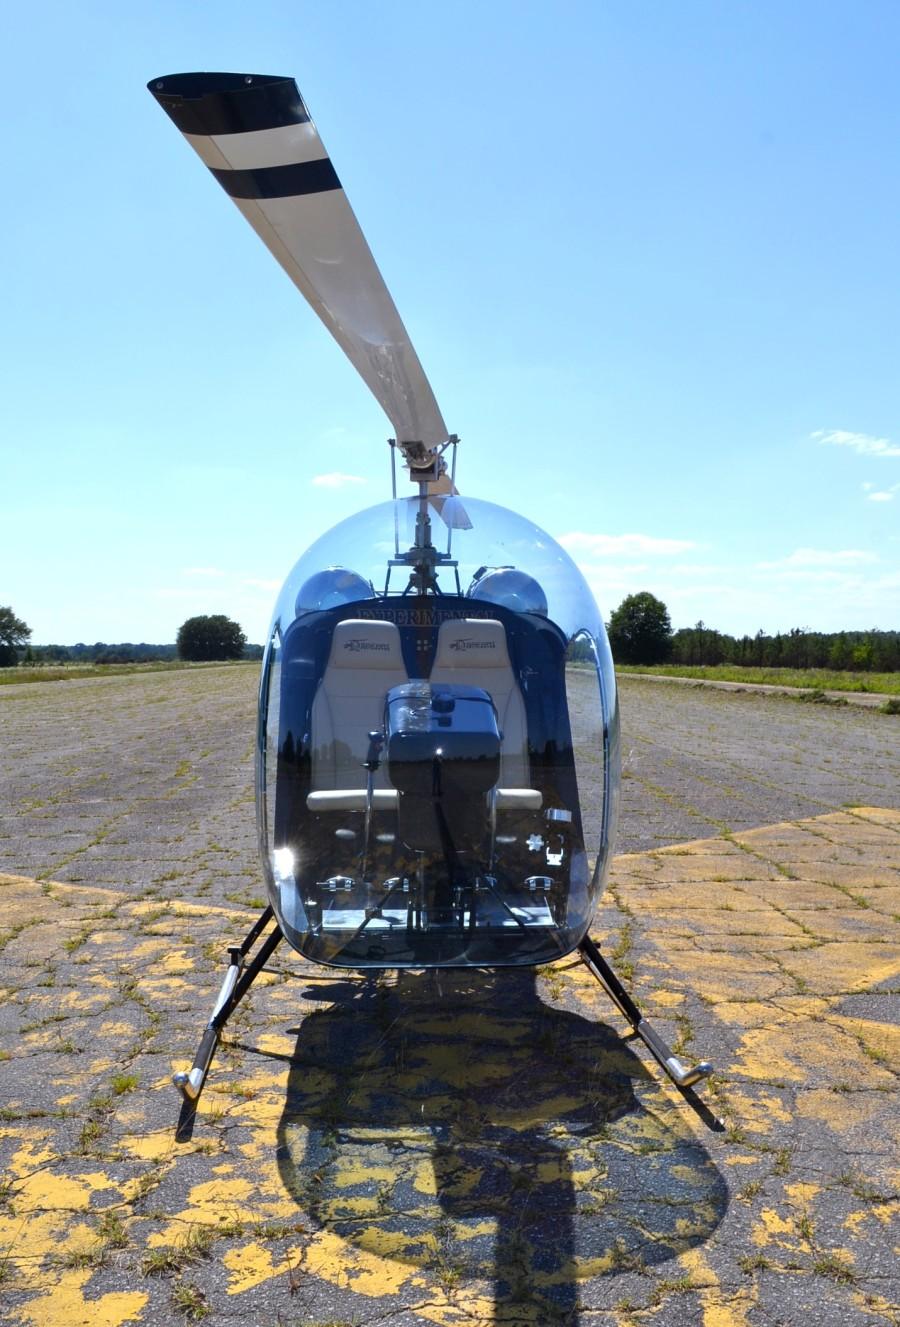 Safar_Helicopter_Kit85AZ